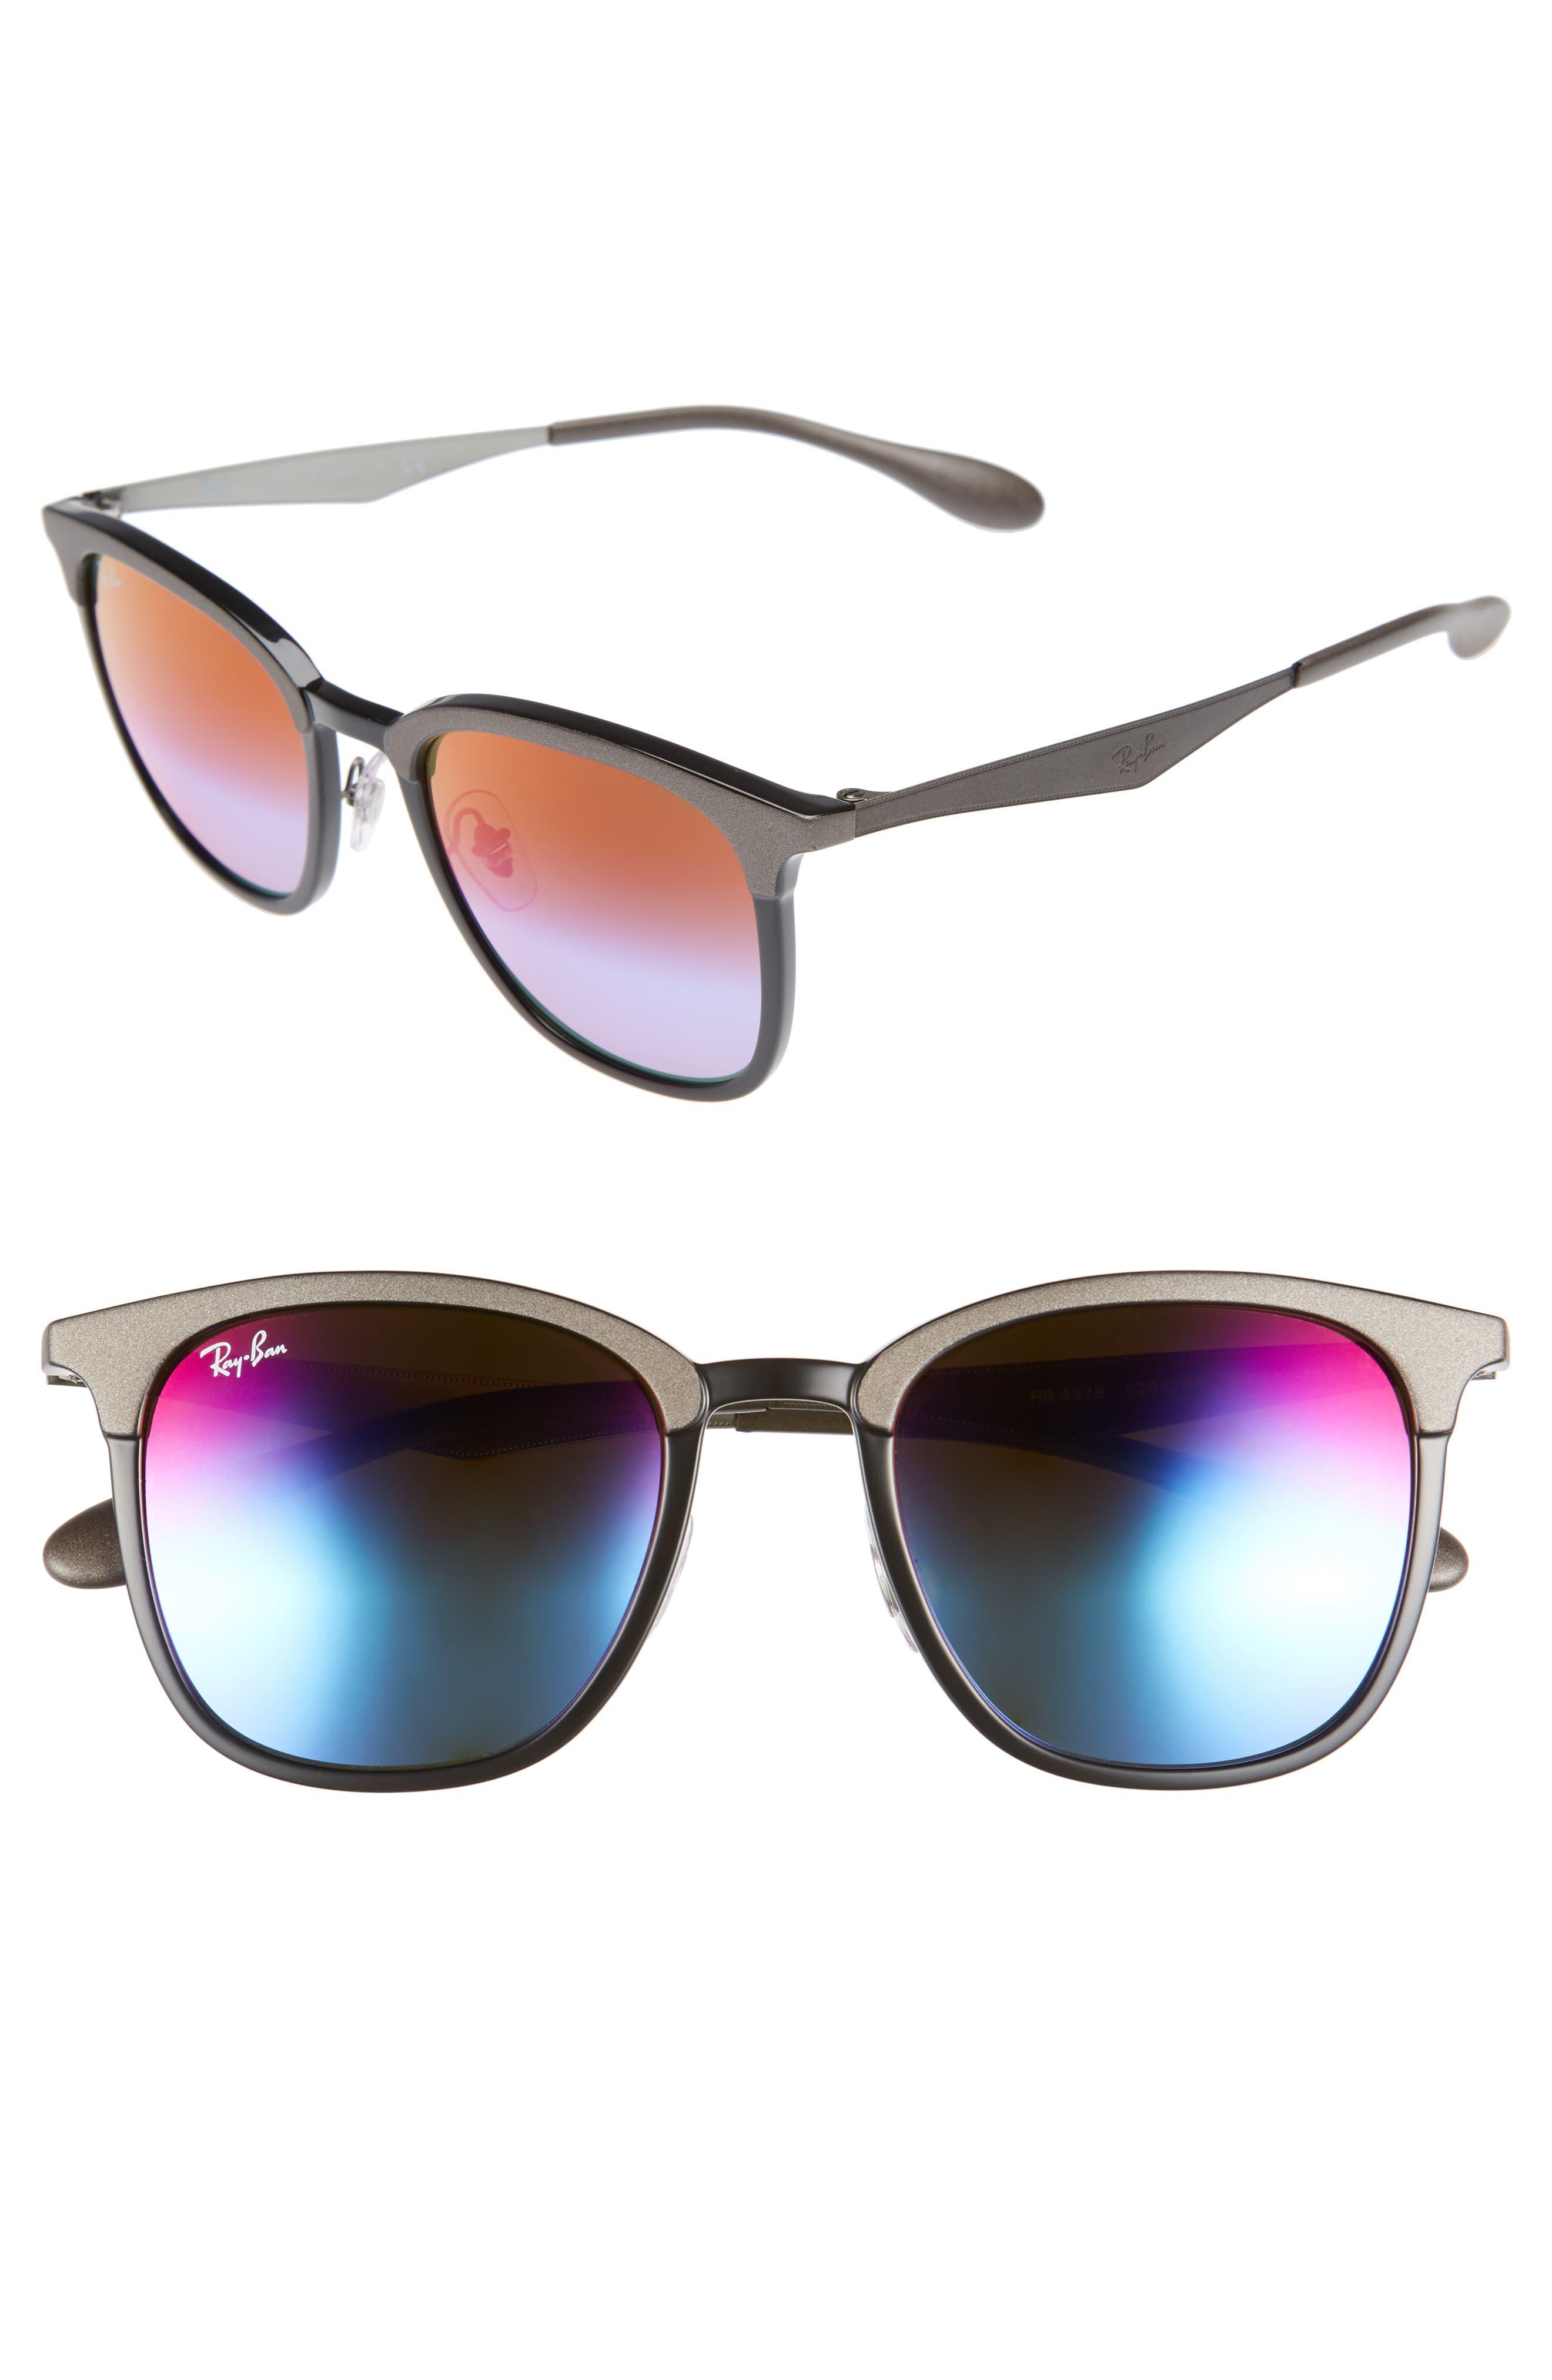 Highstreet 51mm Sunglasses,                         Main,                         color, Dark Grey